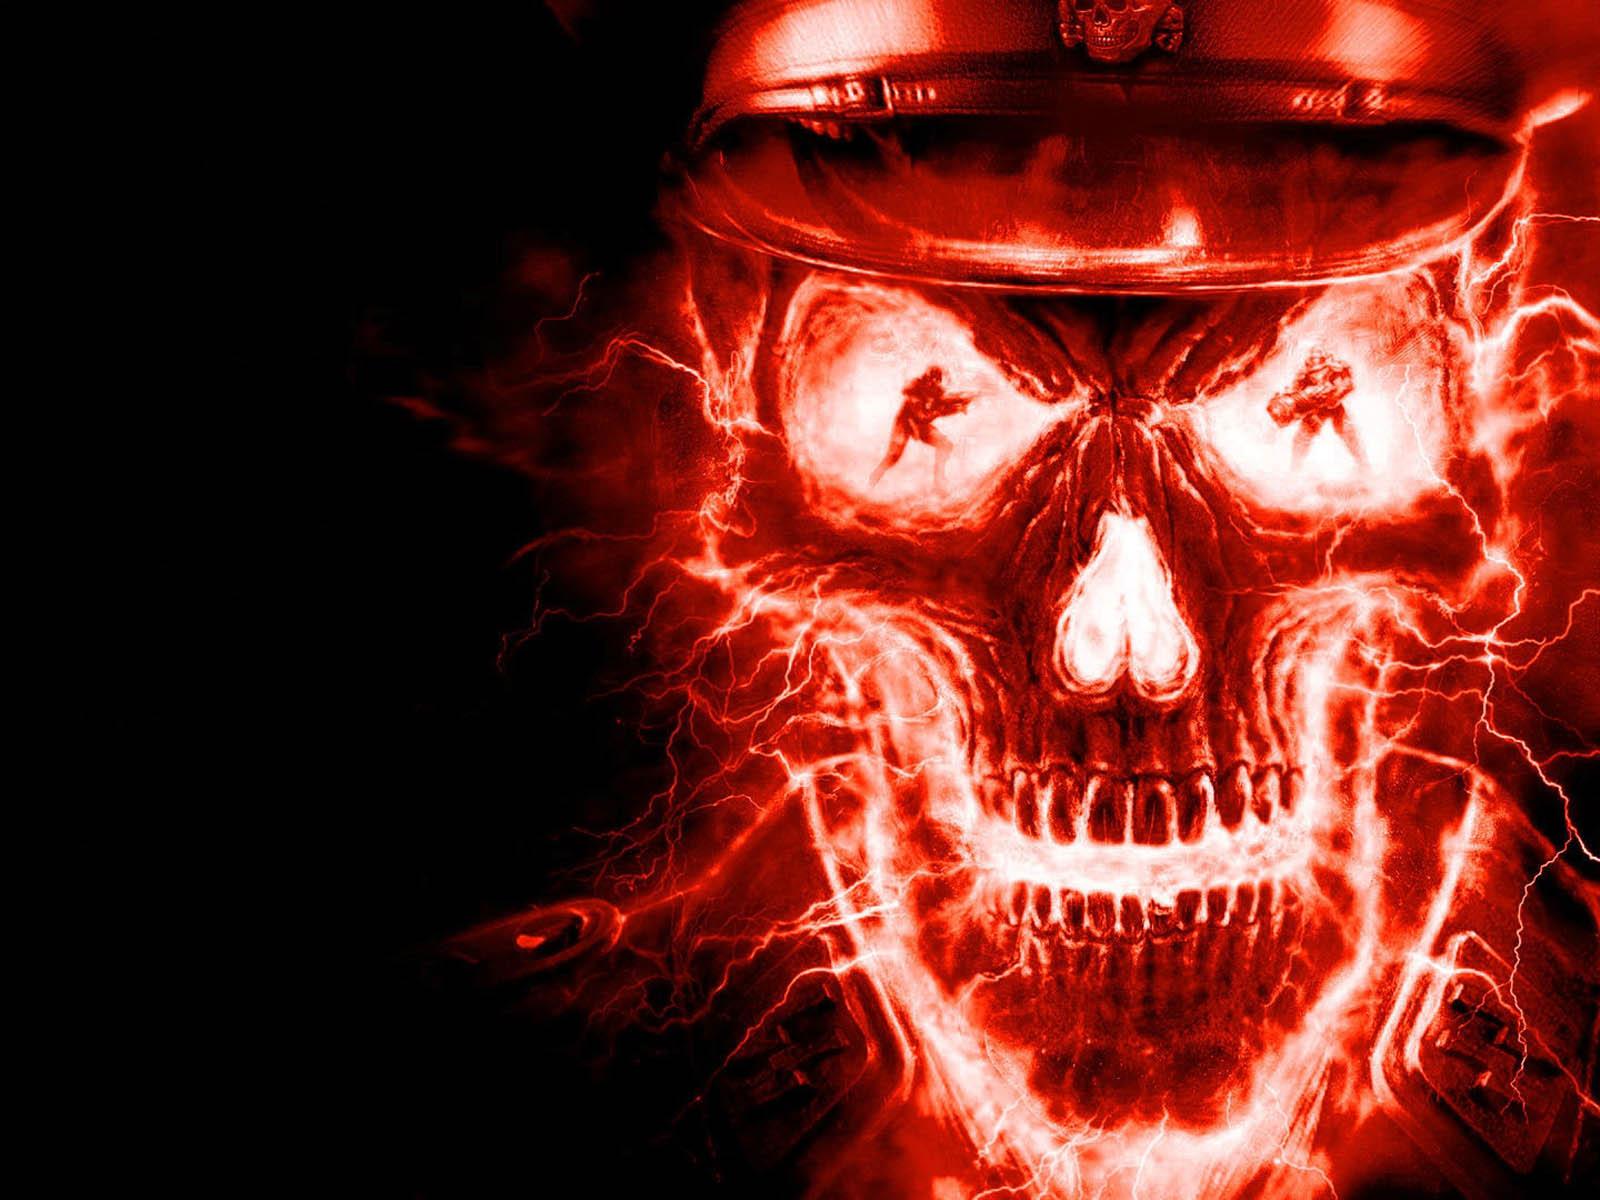 skull wallpapers skull desktop wallpapers skull desktop backgrounds 1600x1200